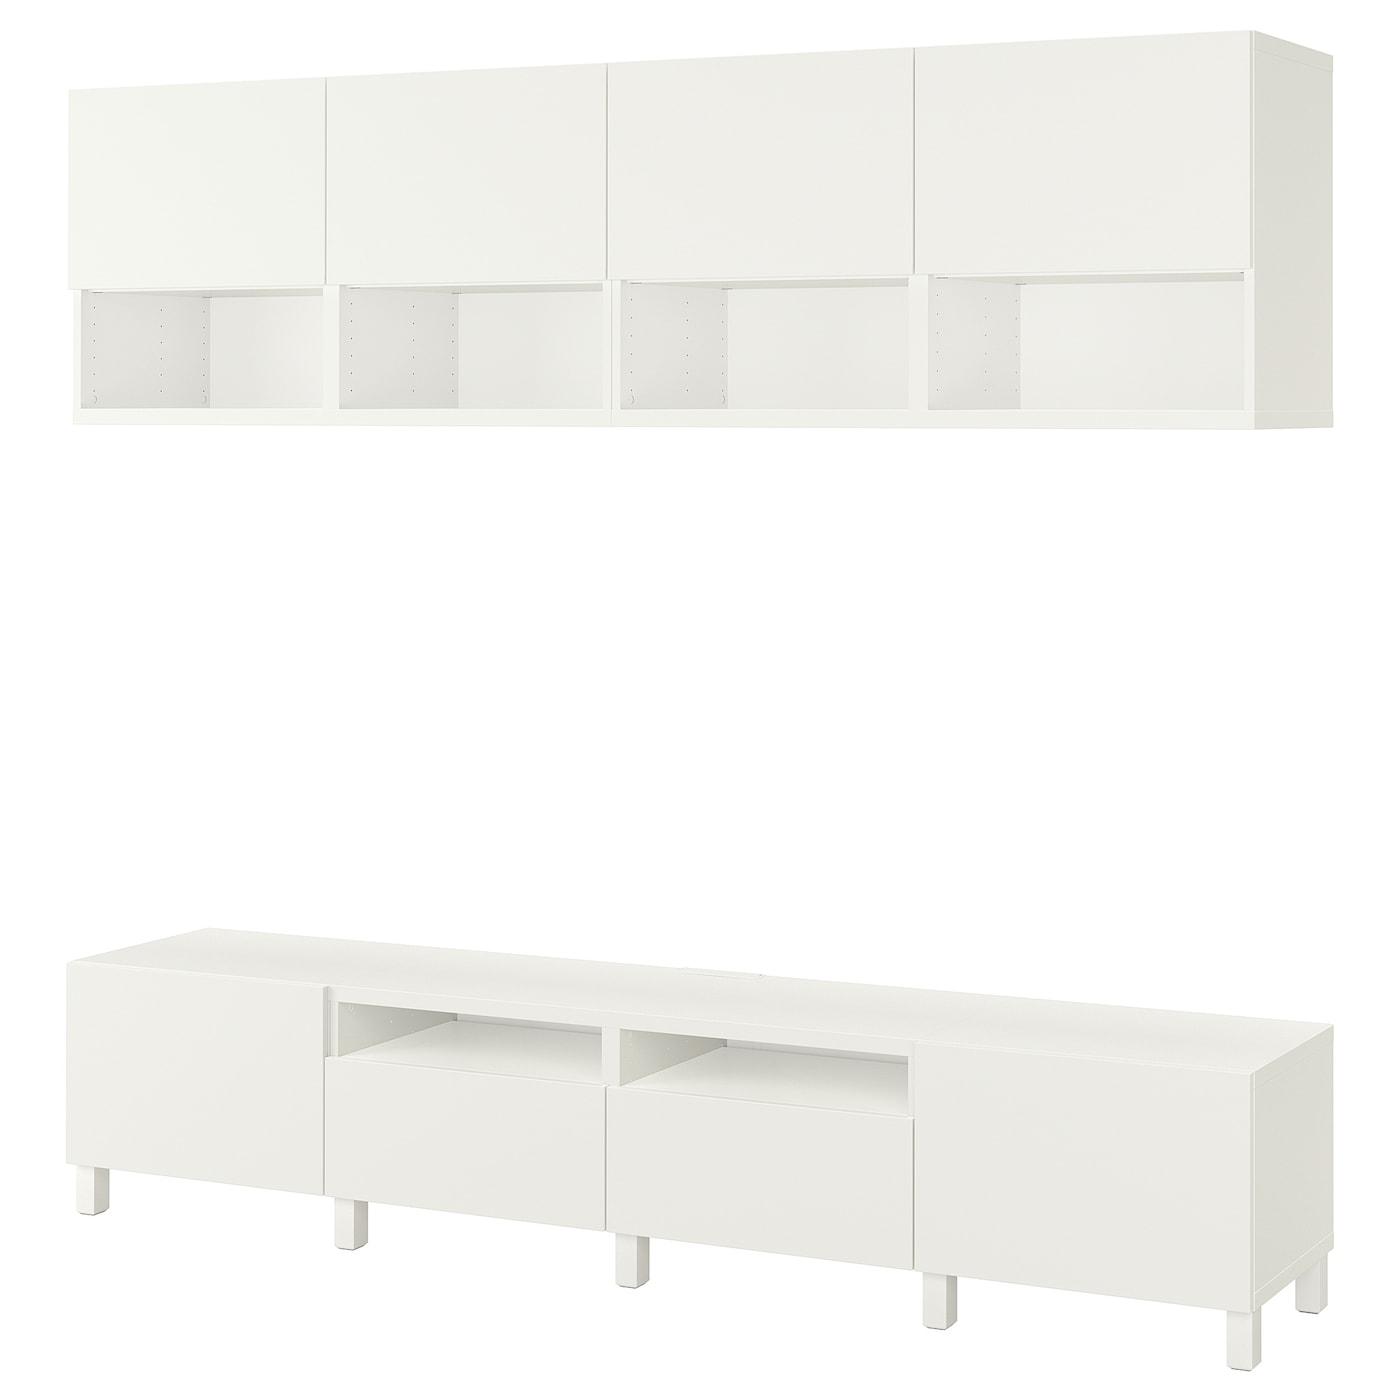 Best combinaison meuble tv blanc lappviken stubbarp Ensemble meuble tv ikea